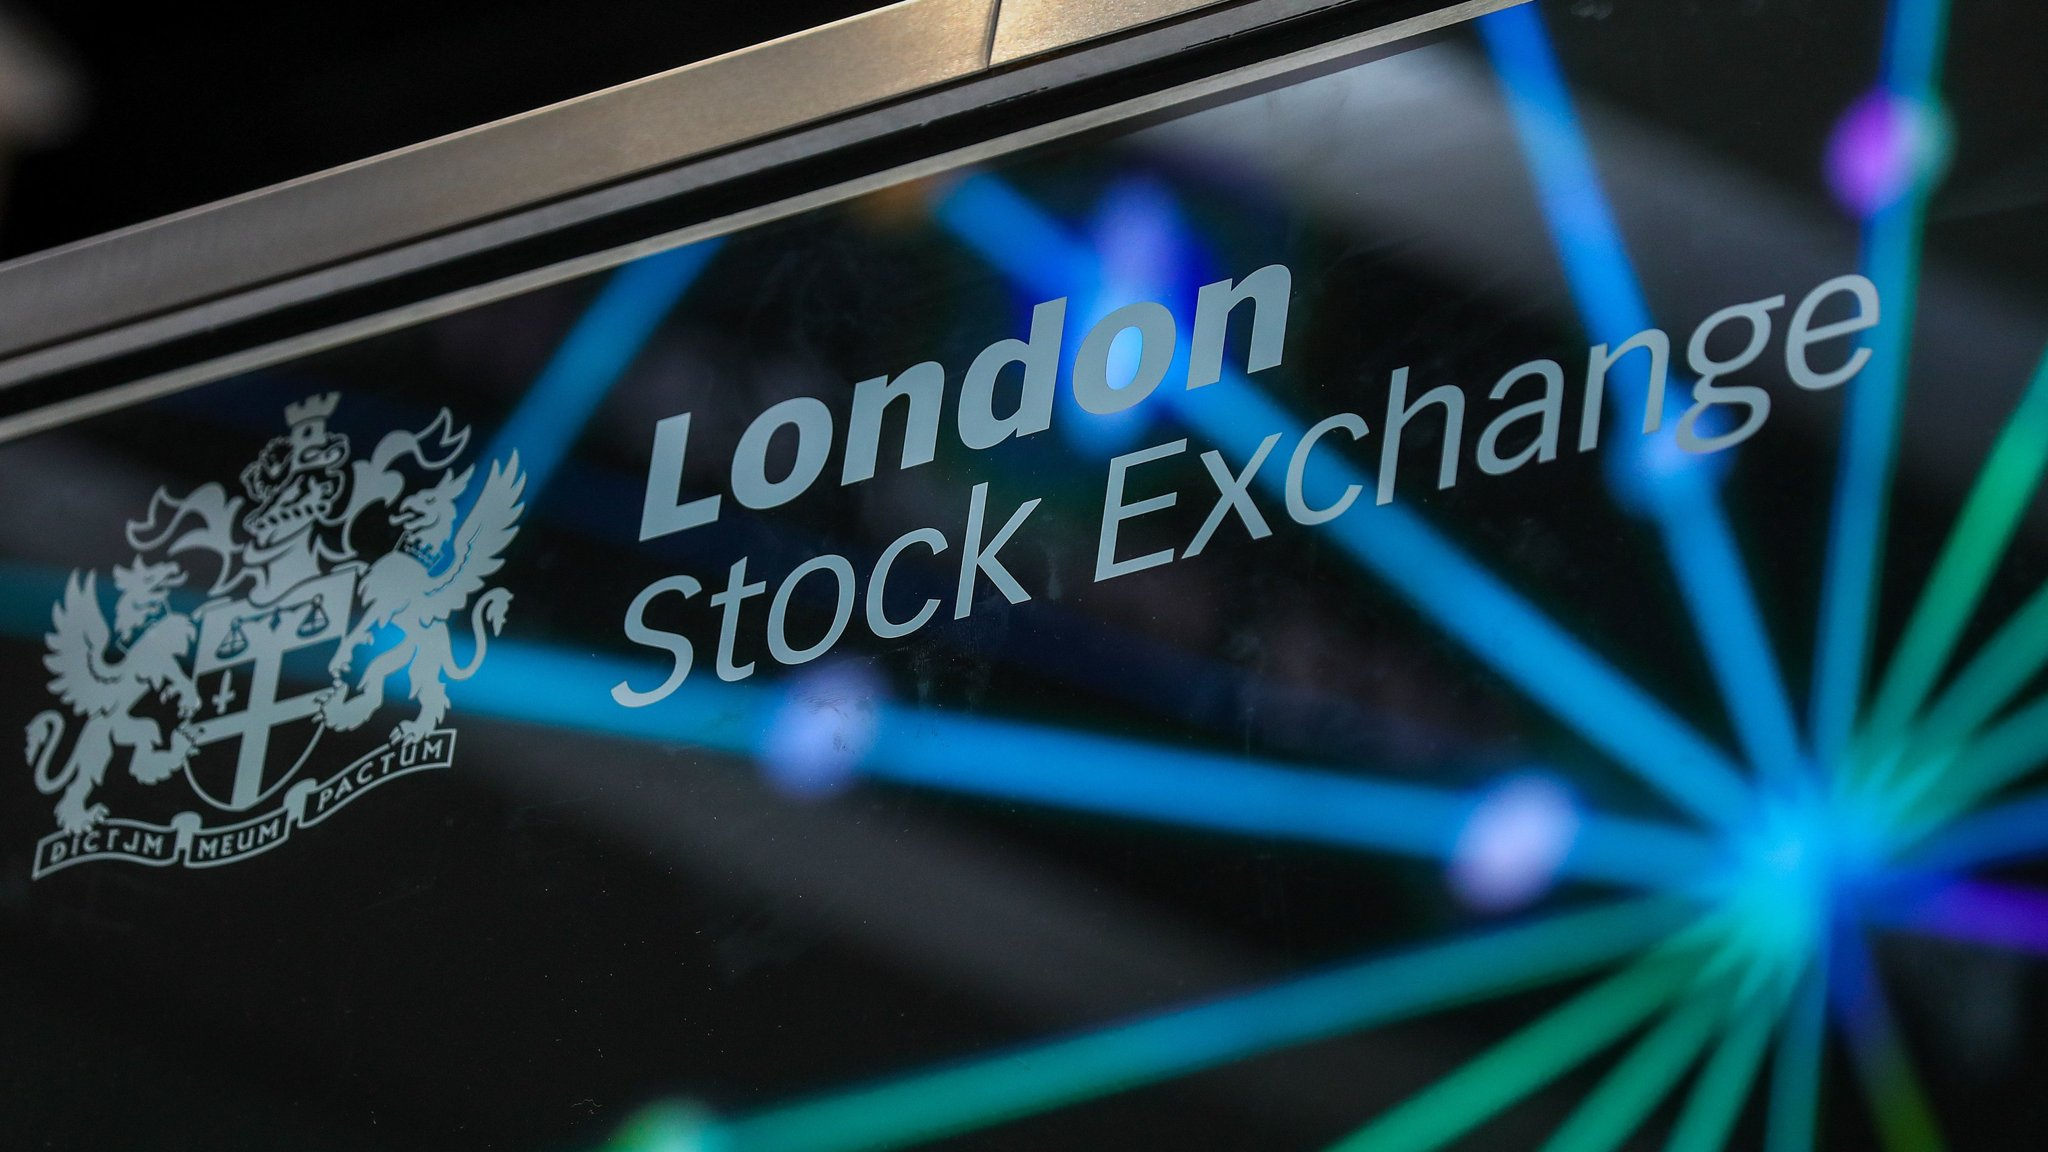 London-Shanghai stock link hailed as 'groundbreaking